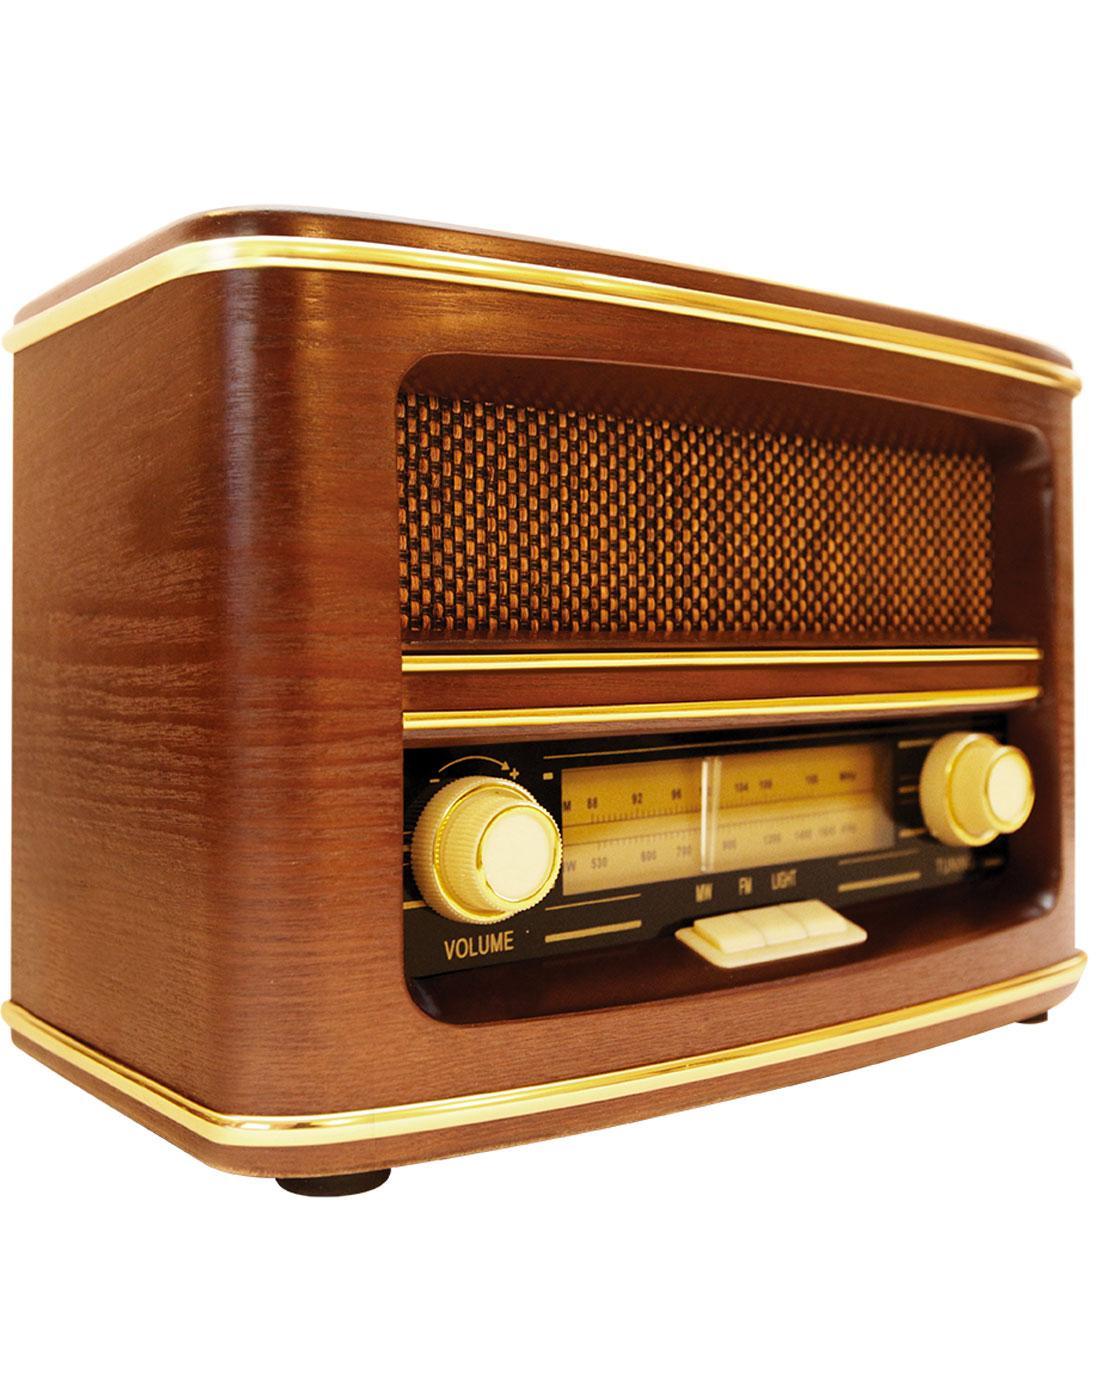 GPO Retro Winchester Vintage Wooden AM/FM Radio